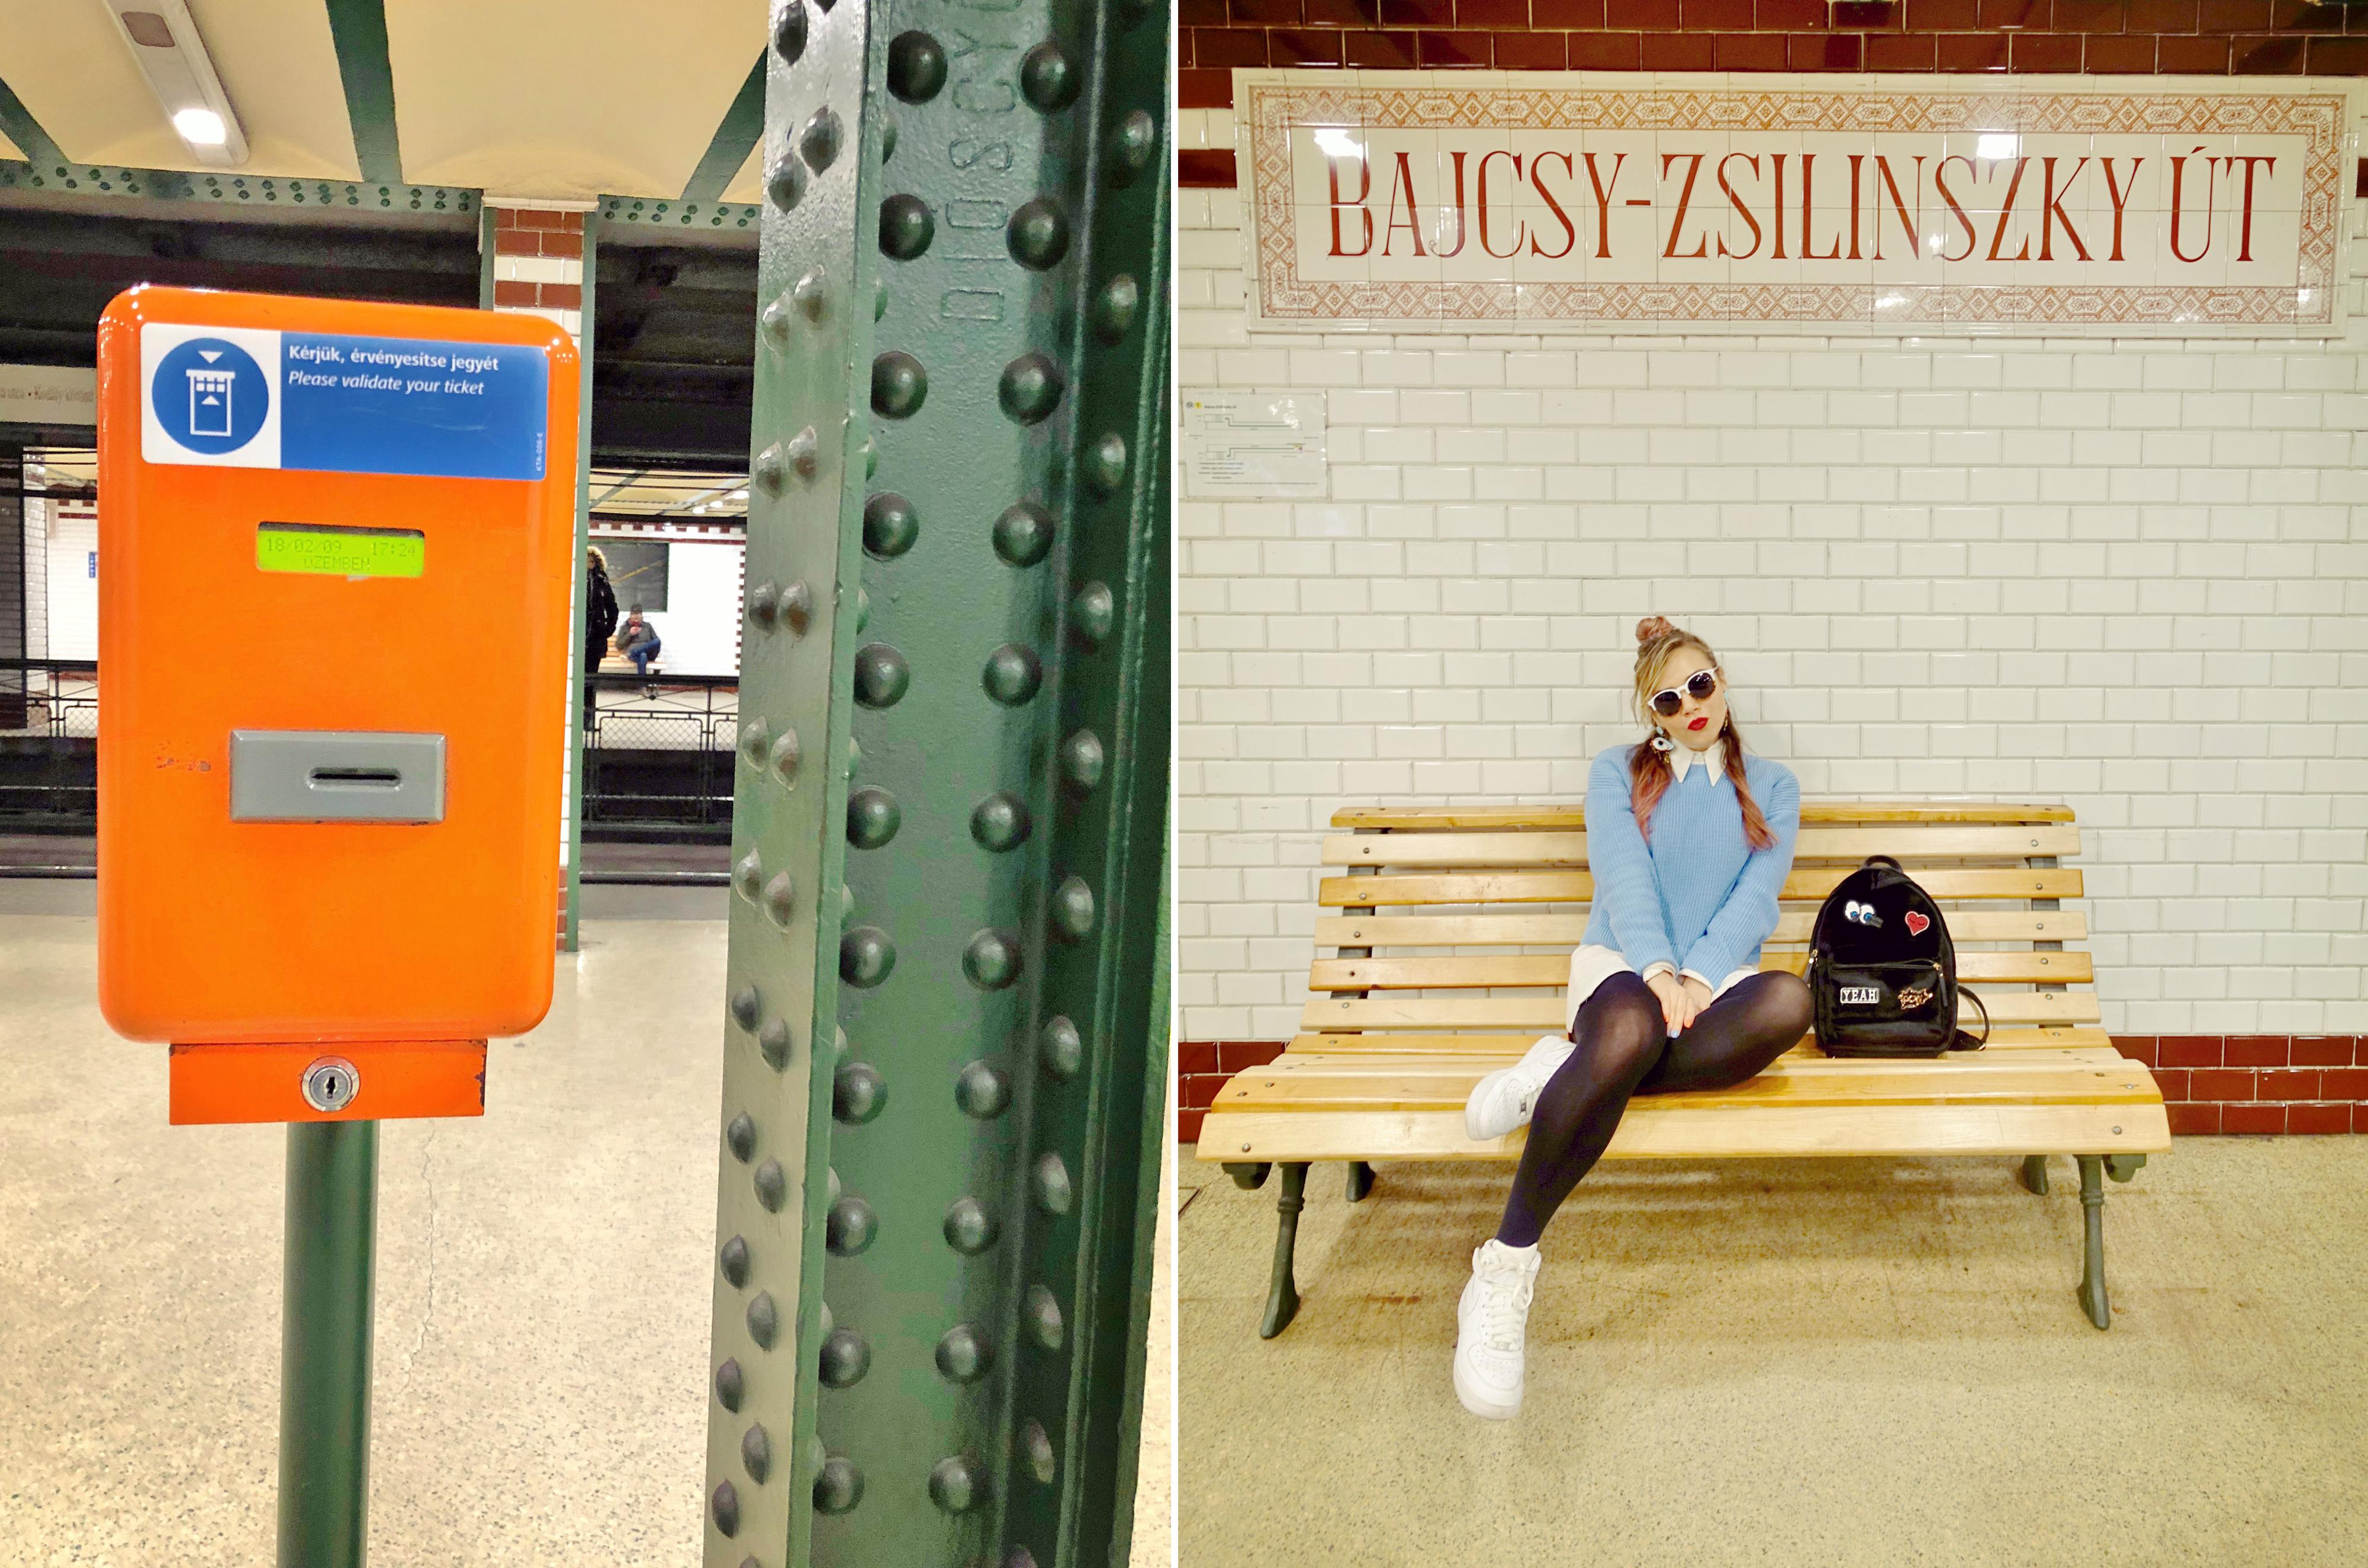 Mochila-bijou-brigitte-blog-de-moda-ChicAdicta-influencer-Chic-Adicta-que-ver-en-budapest-sweaters-cortos-travel-inspo-PiensaenChic-Piensa-en-Chic